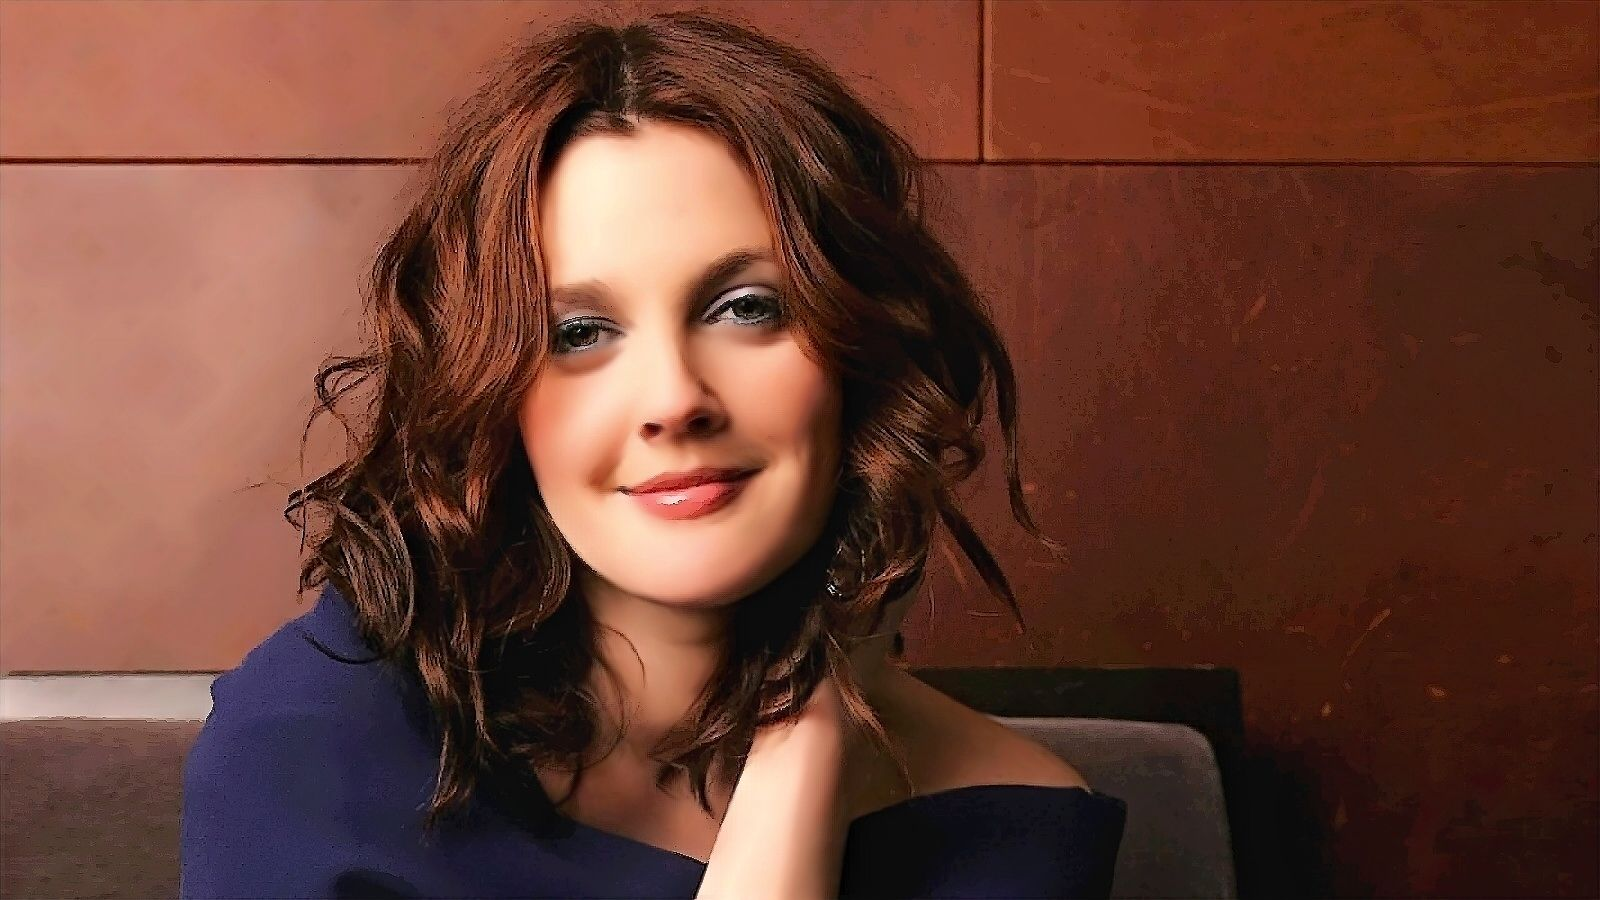 Drew Barrymore Wallpapers HD Wallpapers Красота волос